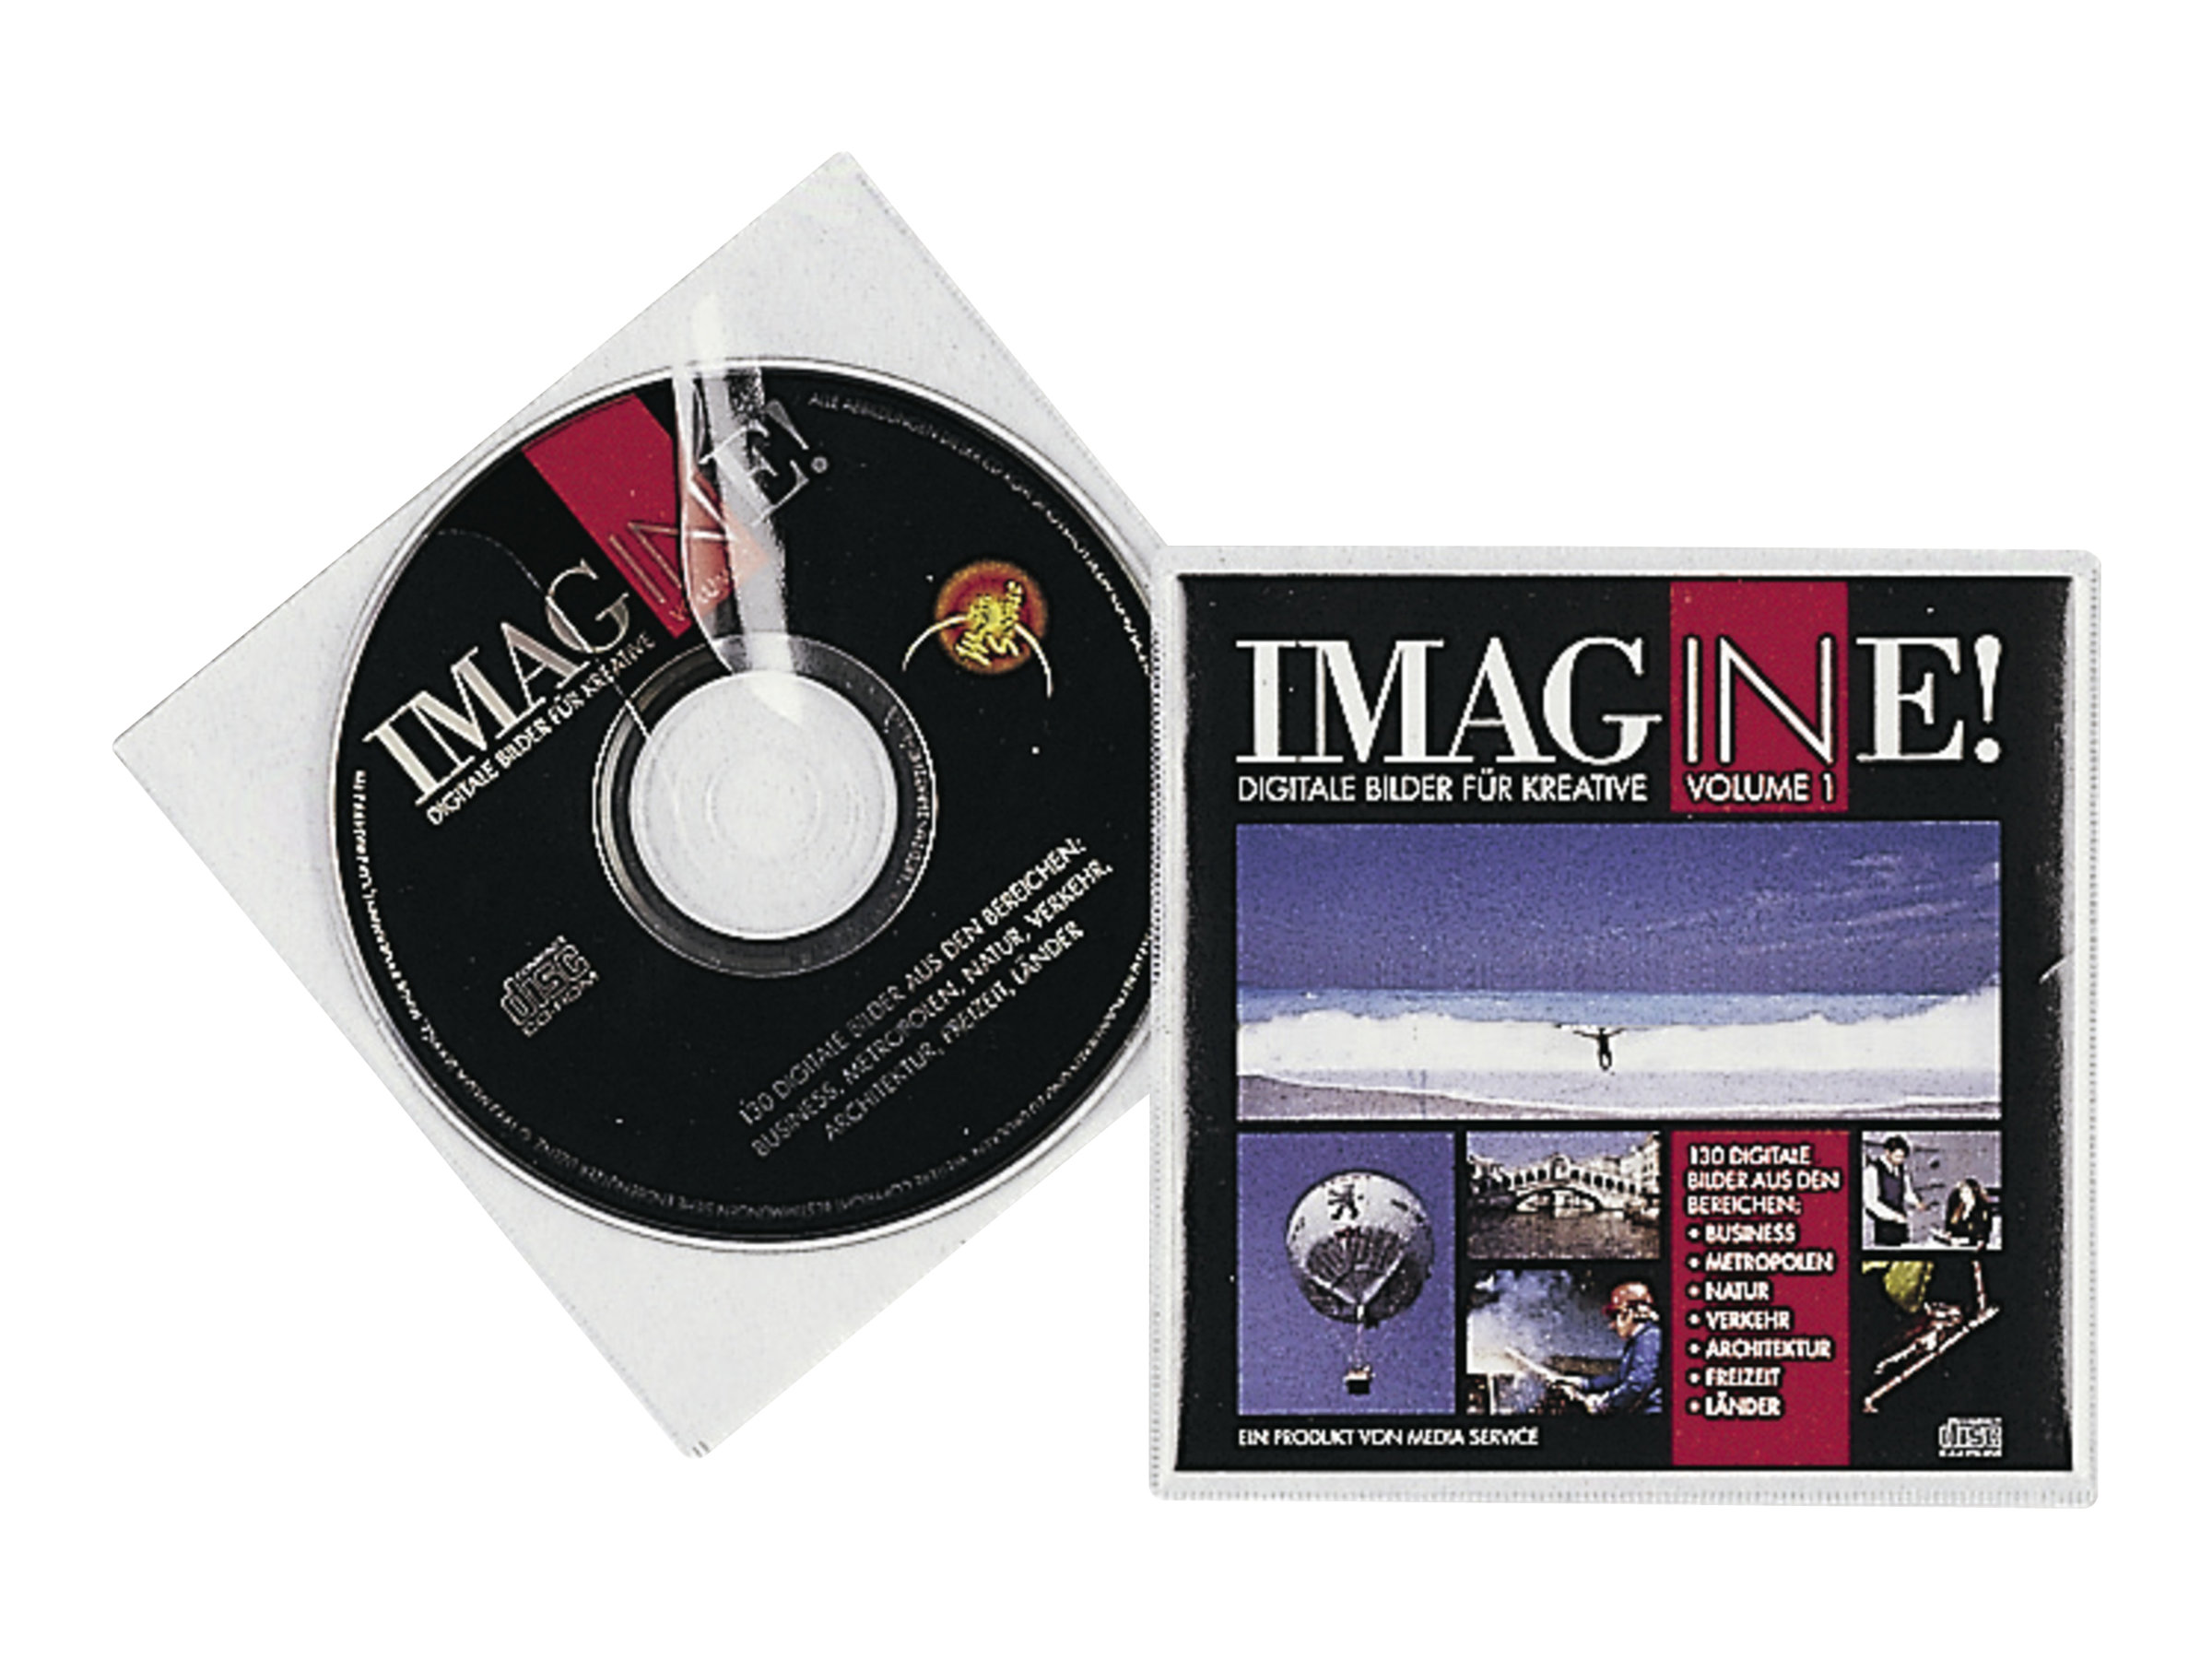 Durable CD COVER Pocket - CD-Hülle - Kapazität: 1 CD - durchsichtig (Packung mit 10)